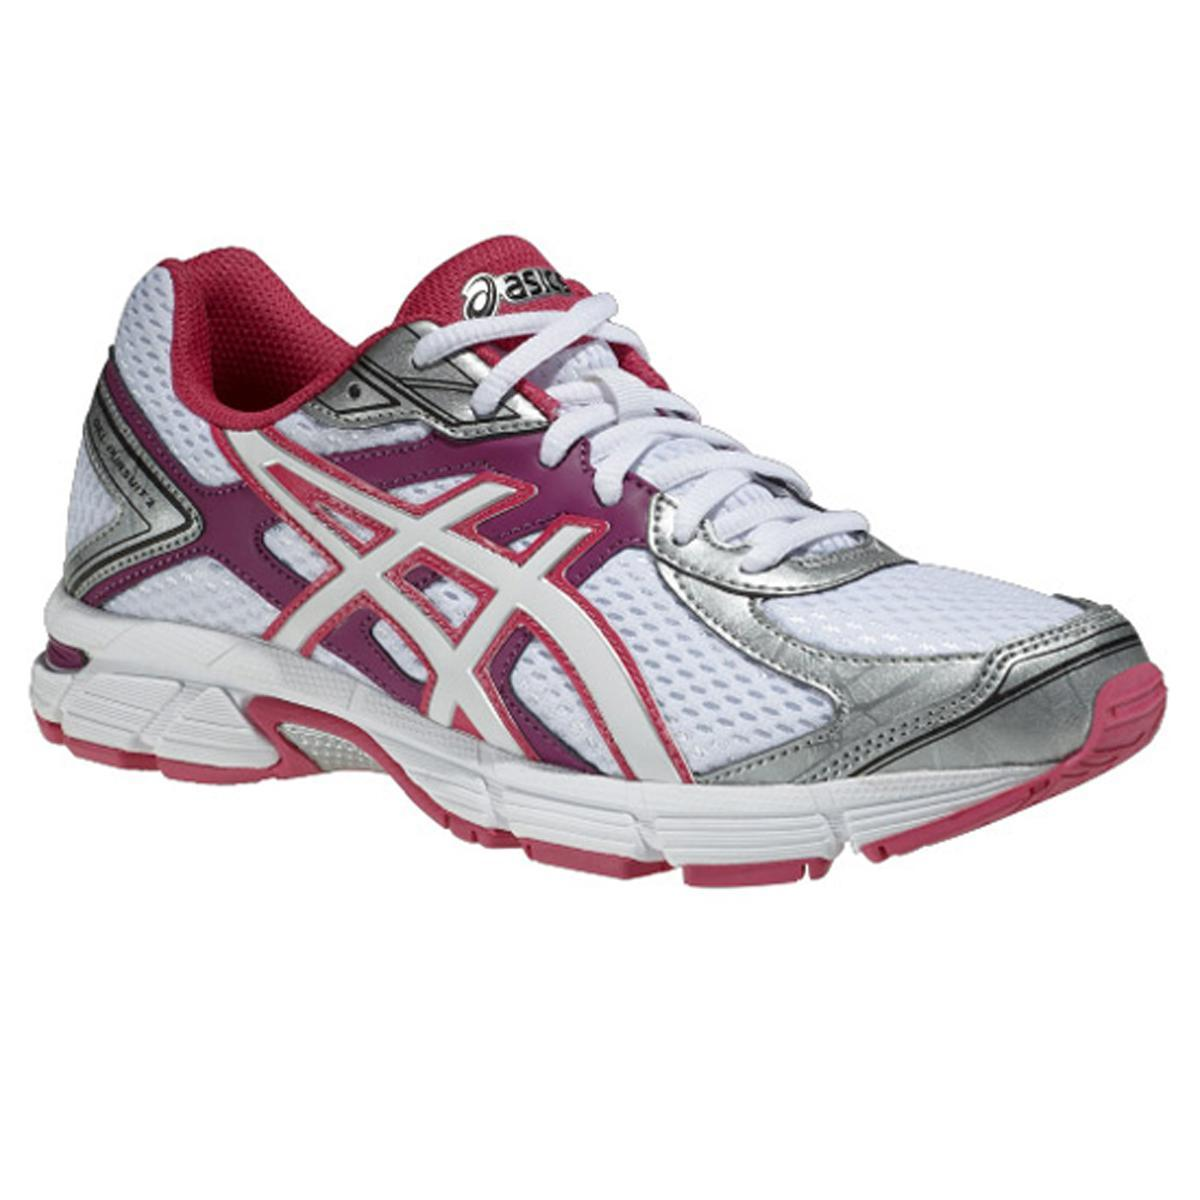 acheter populaire 5bc95 837a6 Asics Womens GEL Pursuit 2 Running Shoes - White/Purple